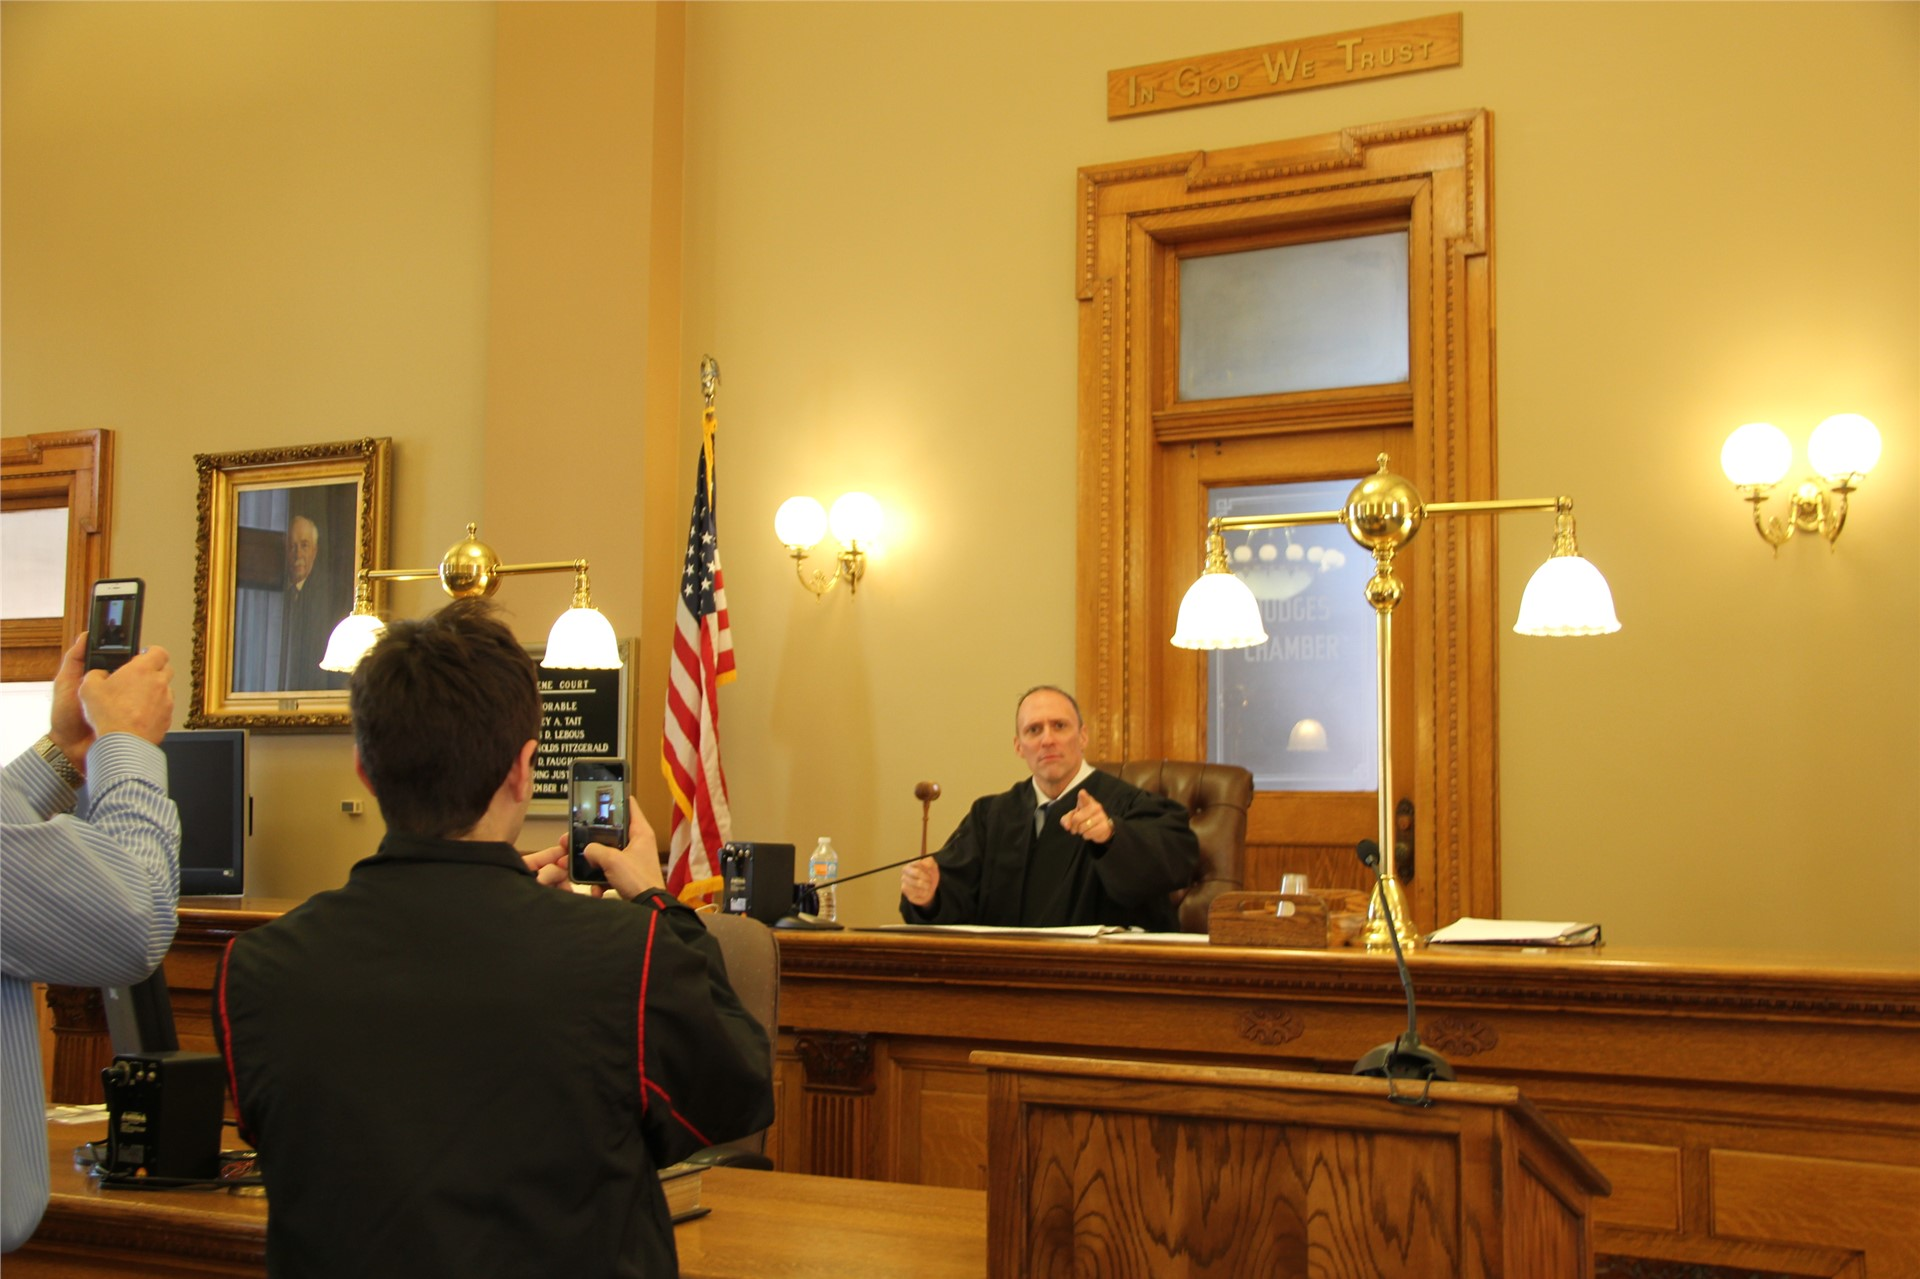 wide shot of teacher sitting at judges seat